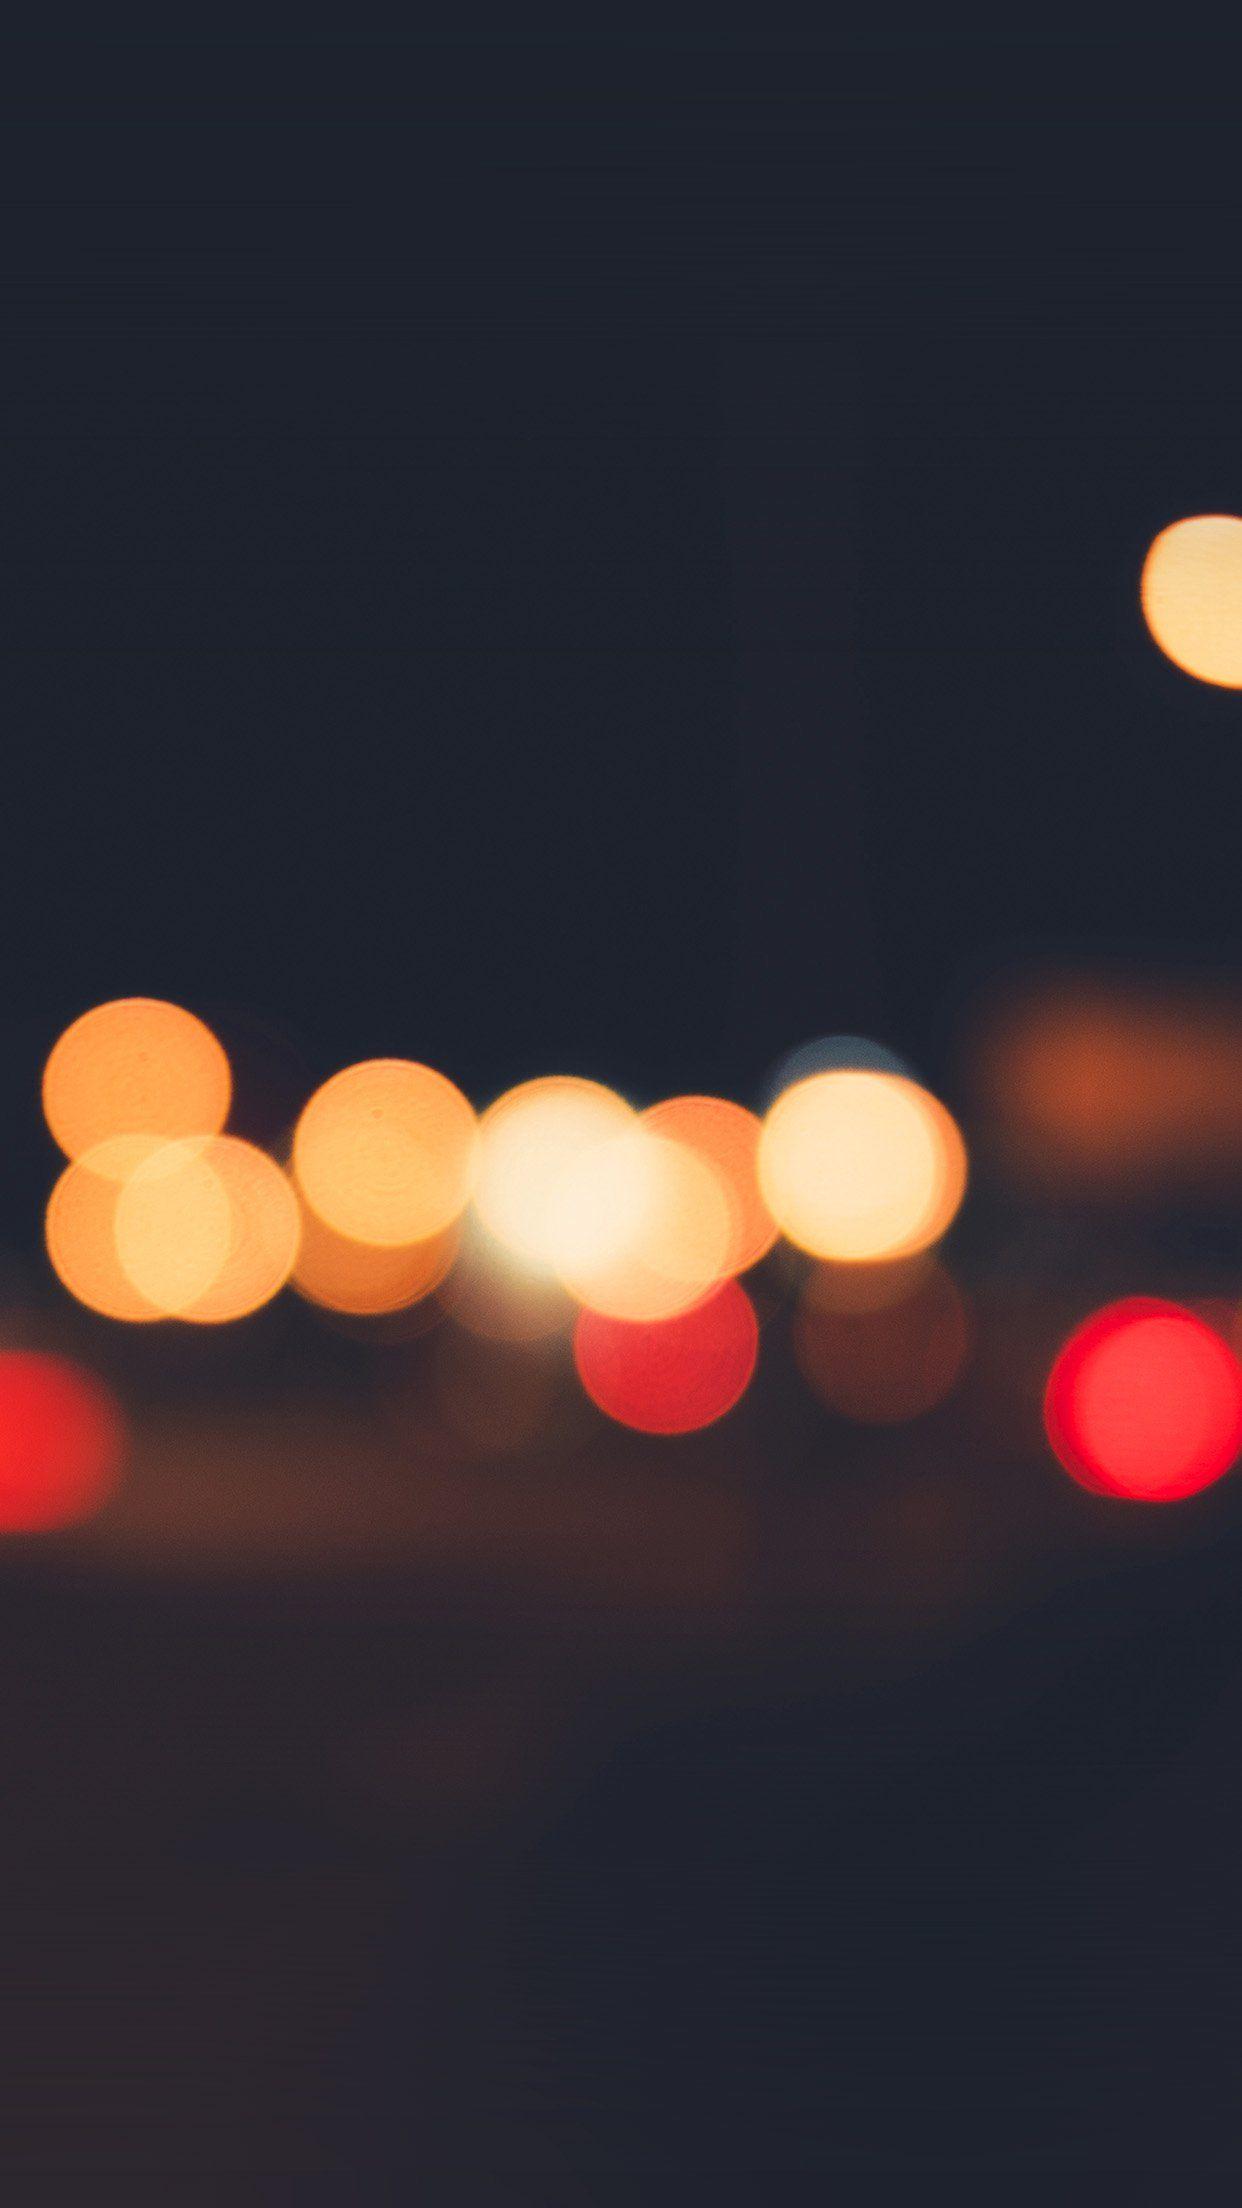 Lights Bokeh Night Blur Pattern iPhone 6 wallpaper | iPhone Love ...